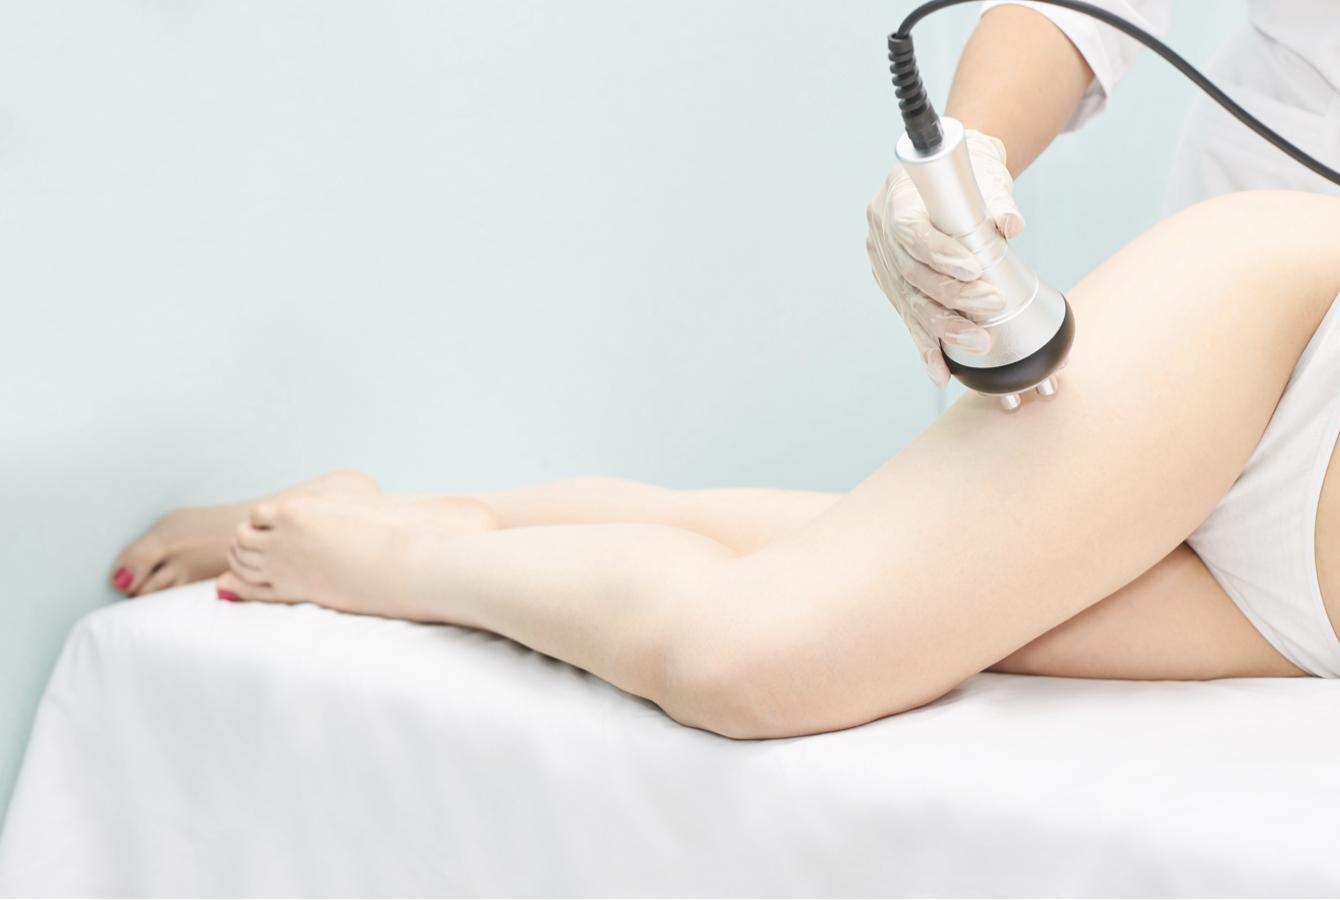 Ultrasonic Cavitation treatment on the upper thigh